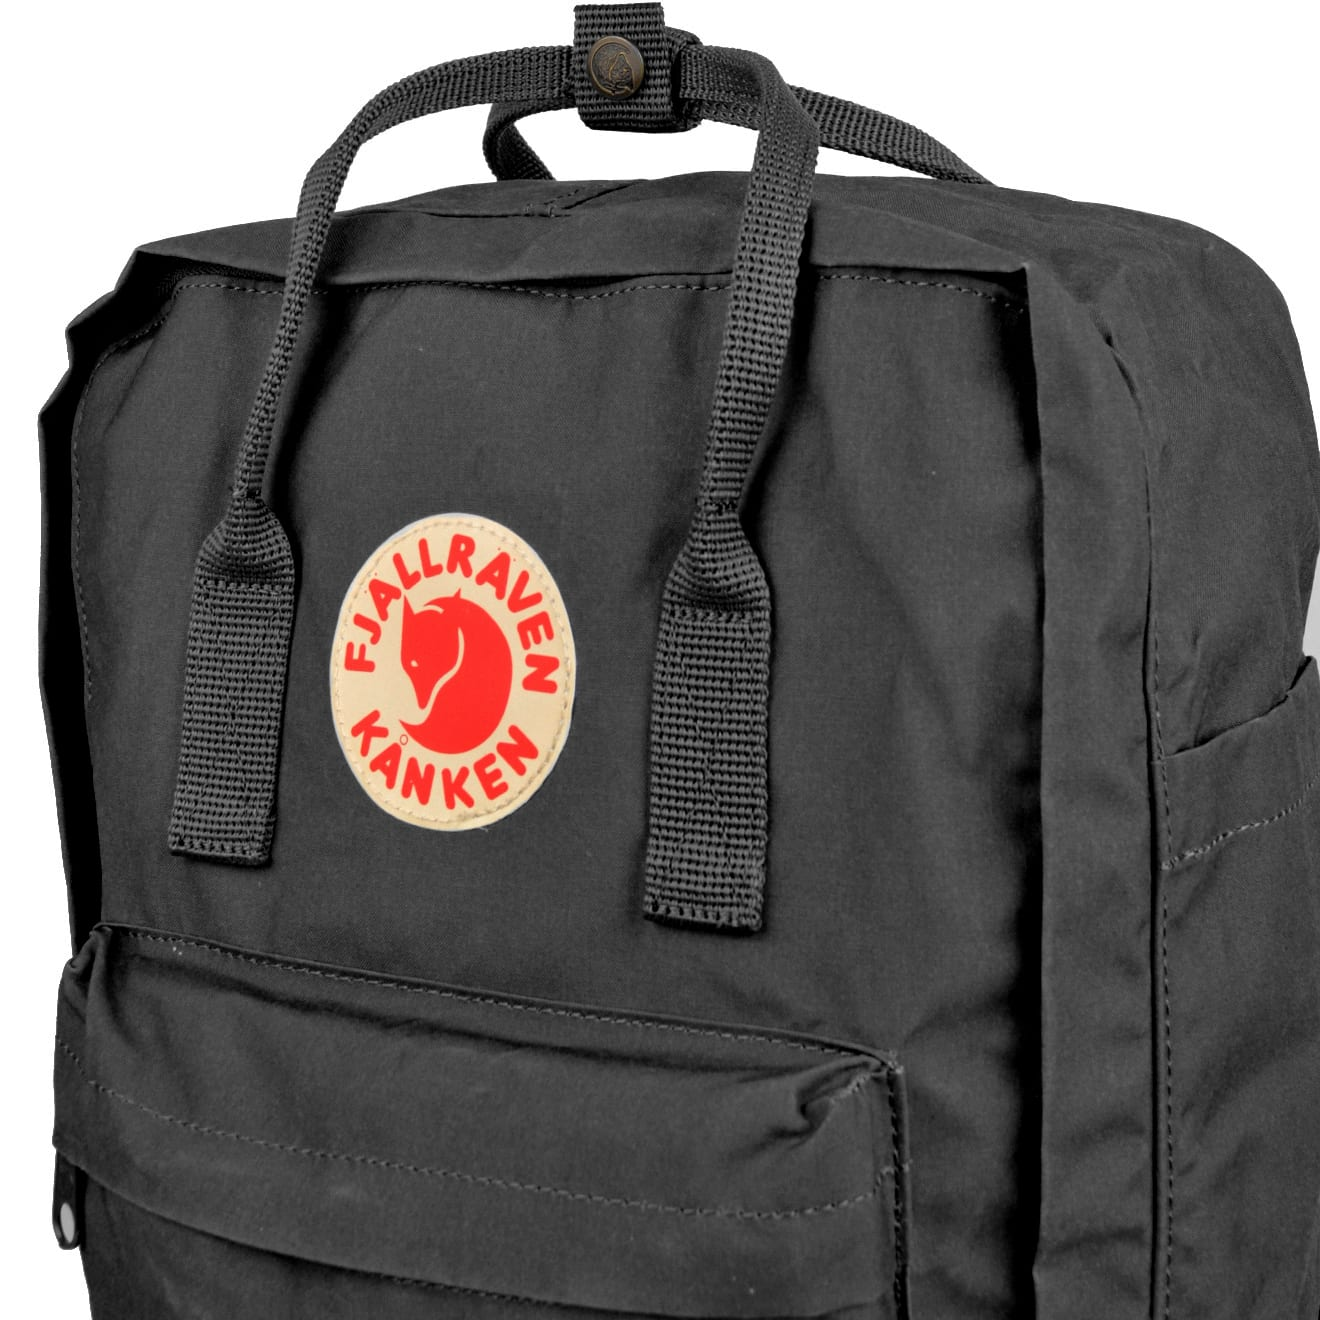 Kanken Classic Black Backpack - Black Fj?llr?ven Xev1z